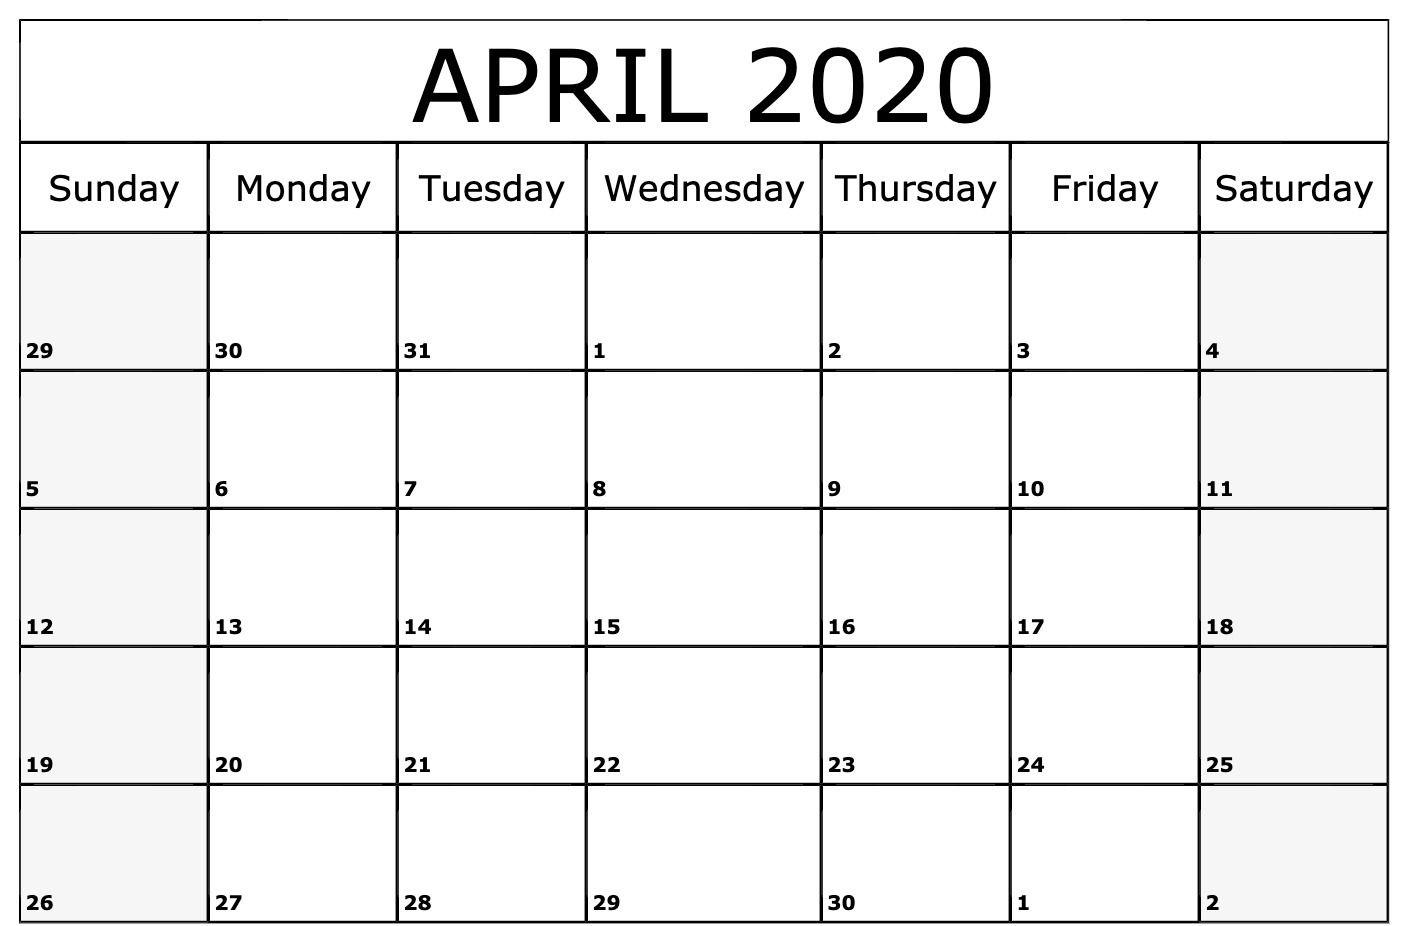 April 2020 Calendar Printable Template | Free Printable